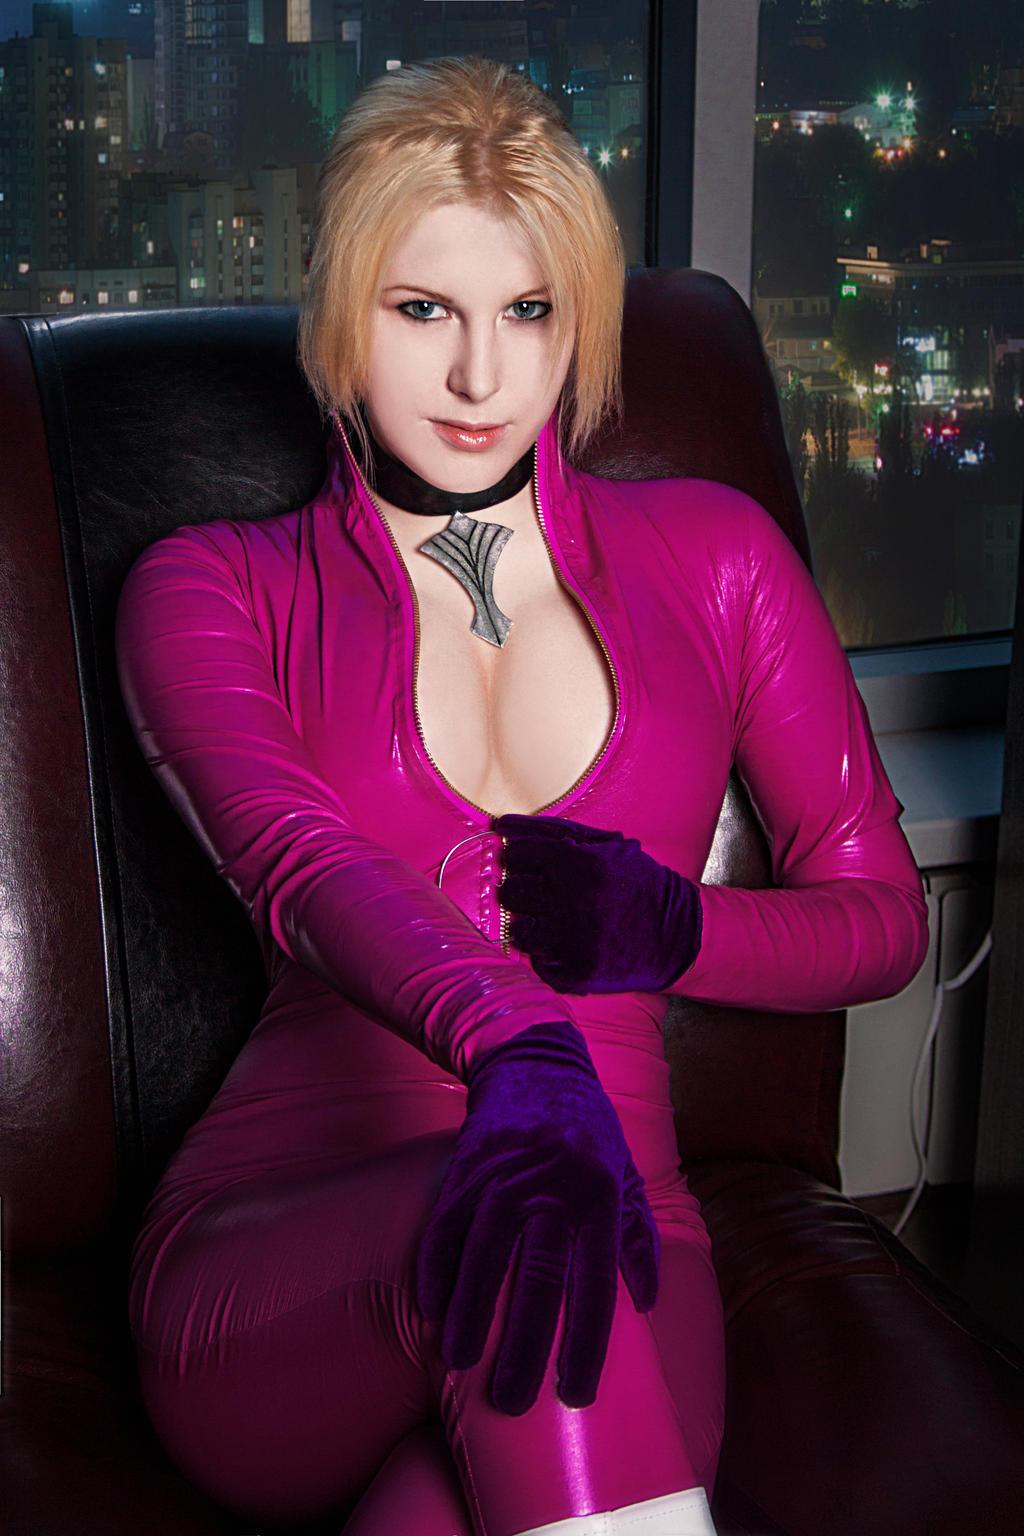 Nina Williams Cosplay Tekken 4 by ZyunkaMukhina on DeviantArt